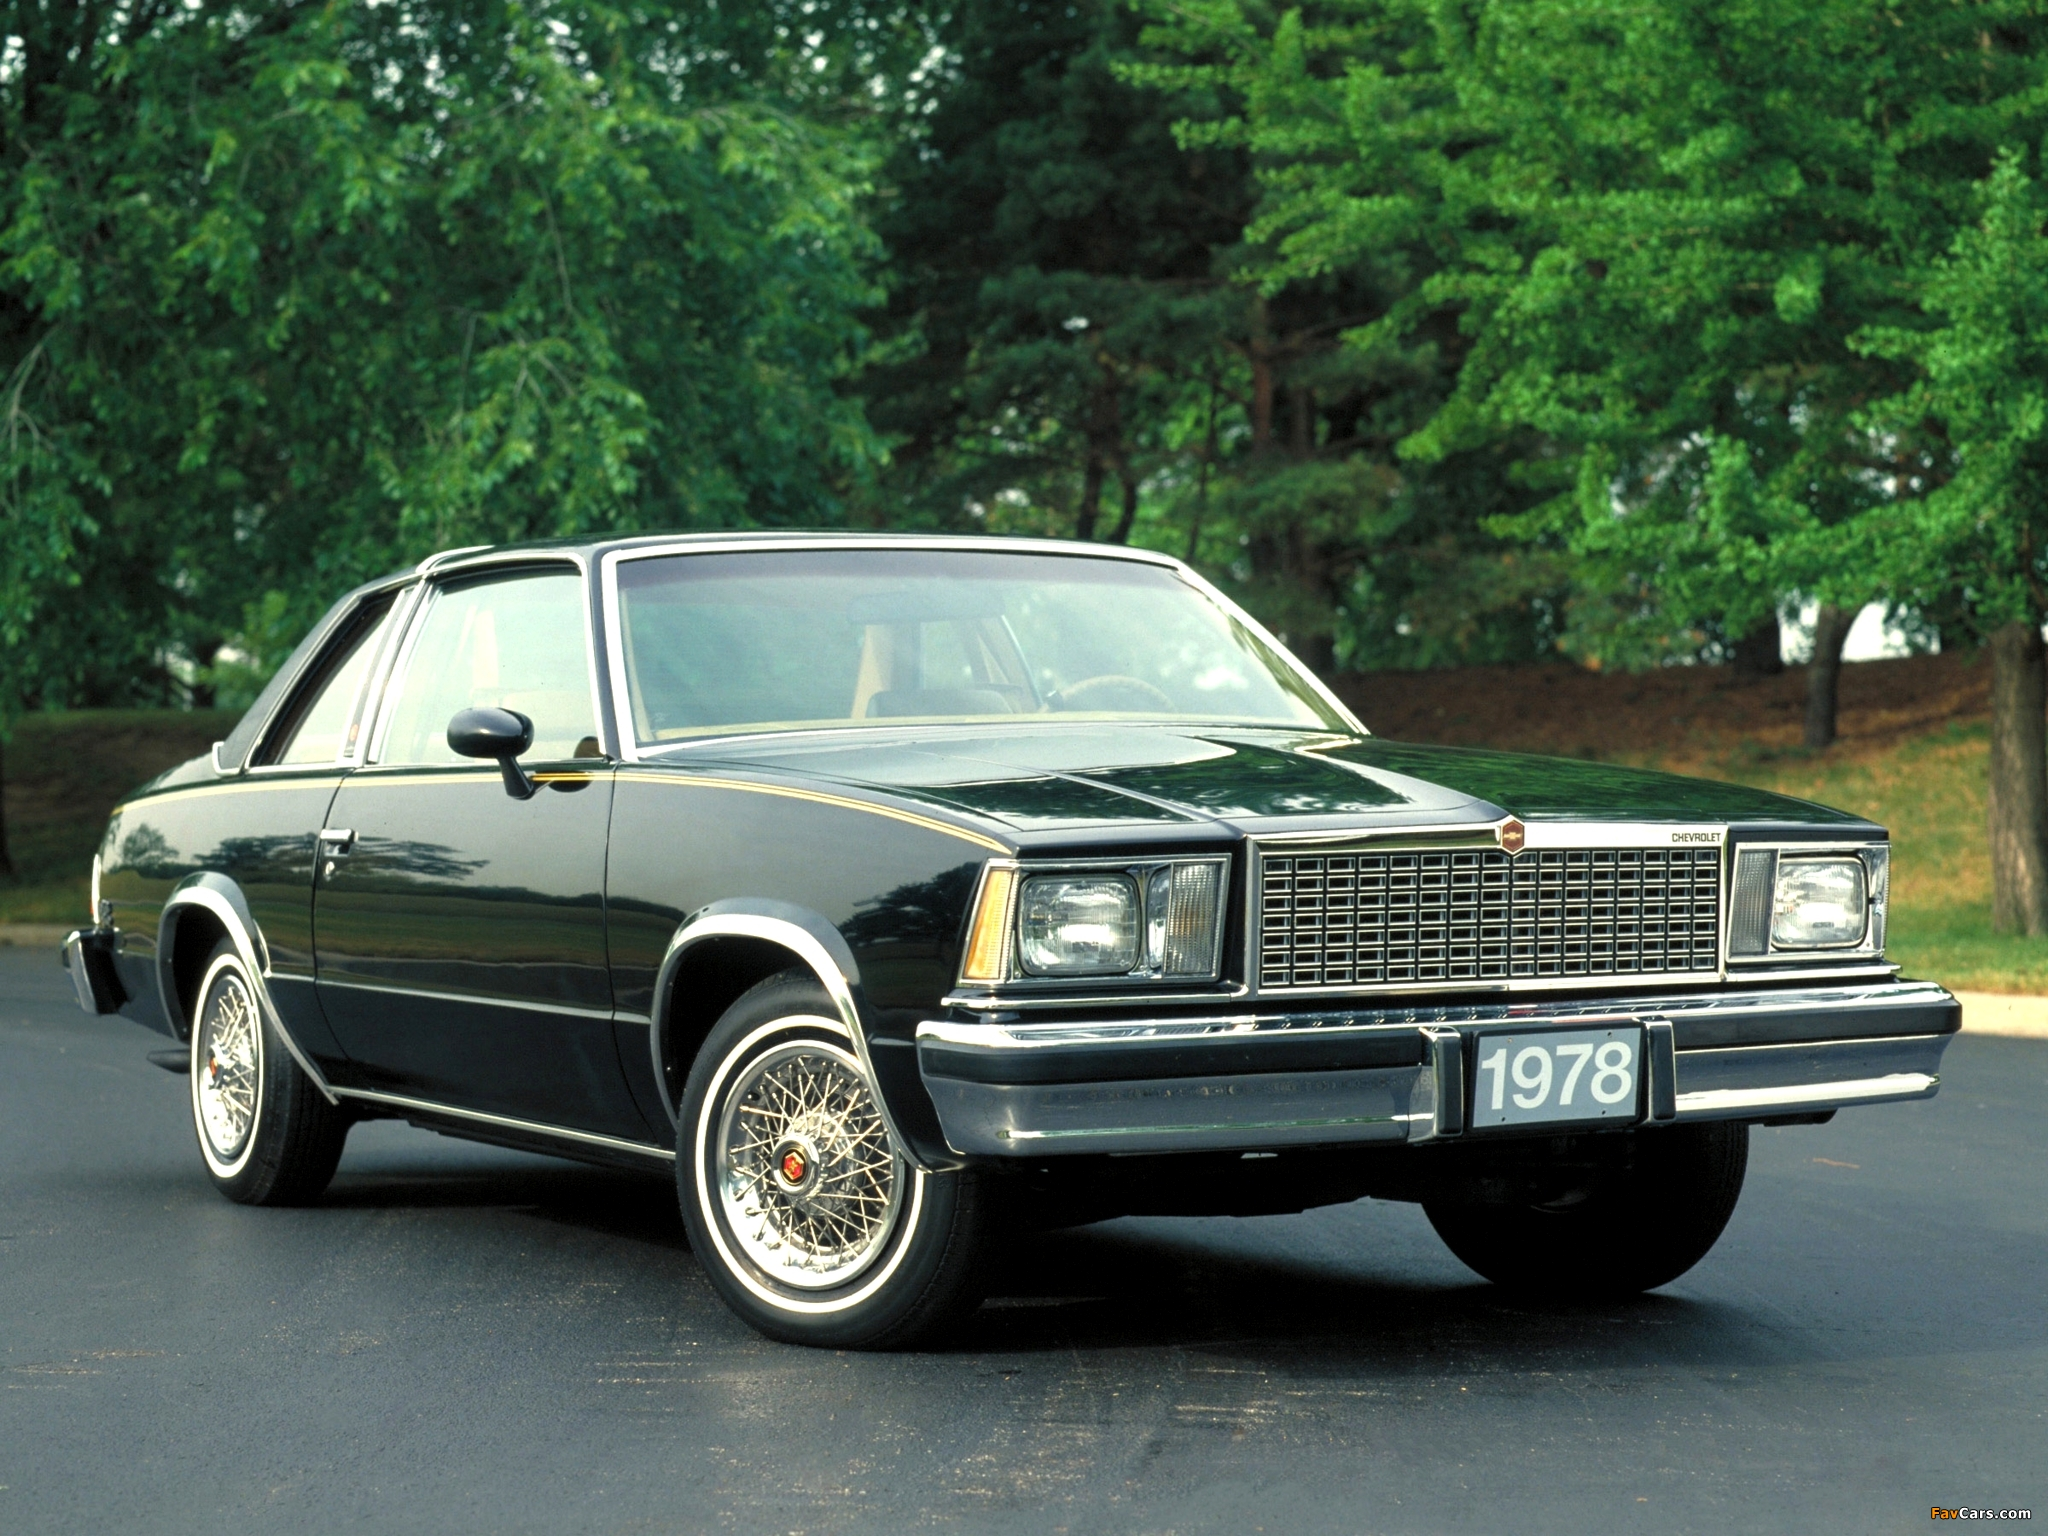 Chevrolet Malibu Classic Landau Coupe 1978 photos (2048 x 1536)